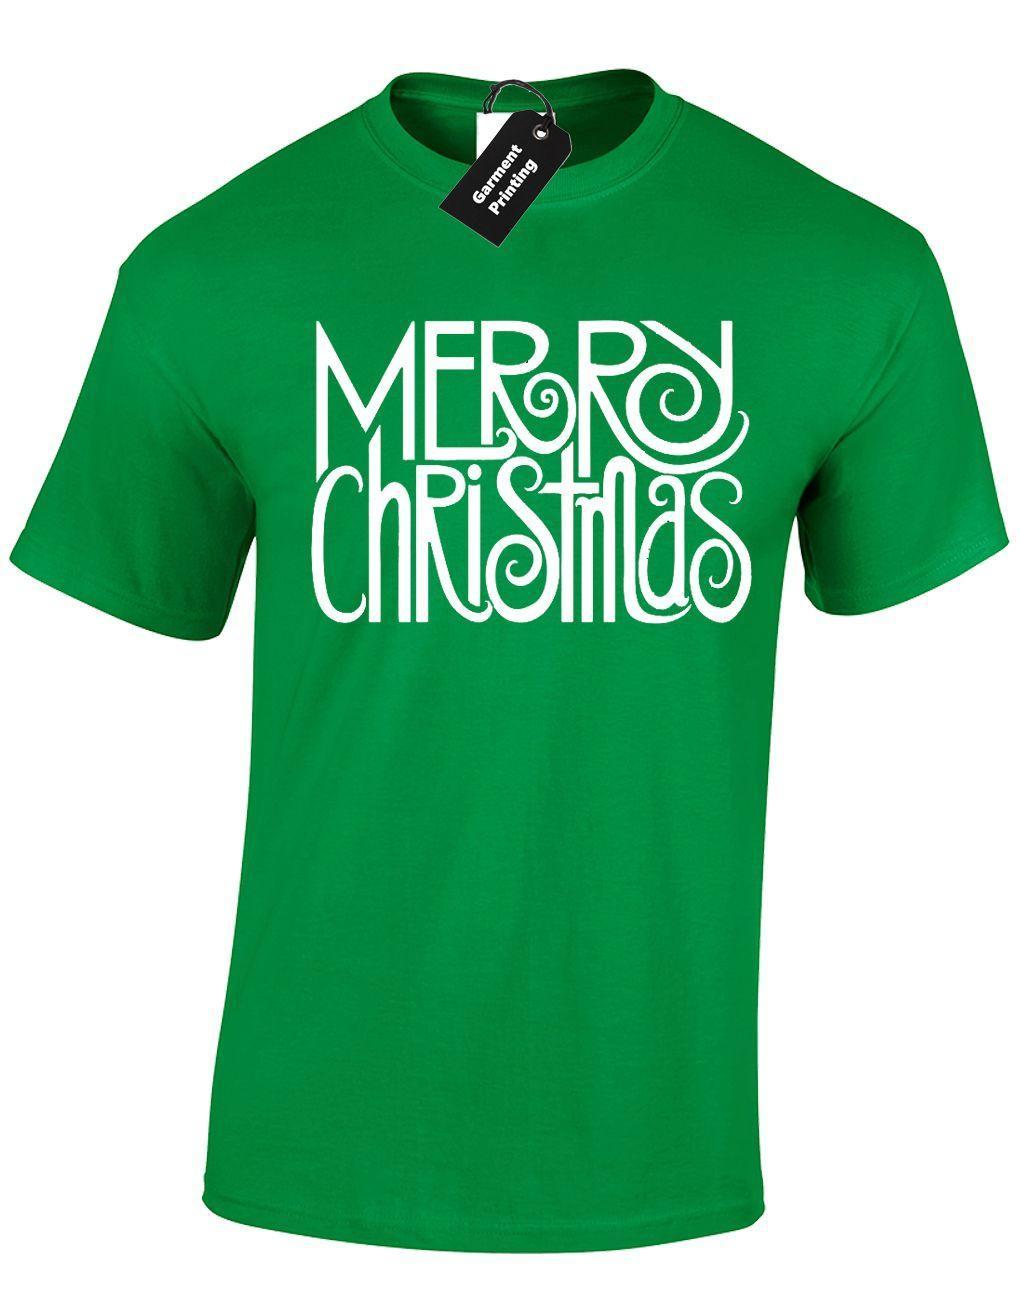 Merry Christmas Design Mens T Shirt Cool Festive Xmas Jumper Santa